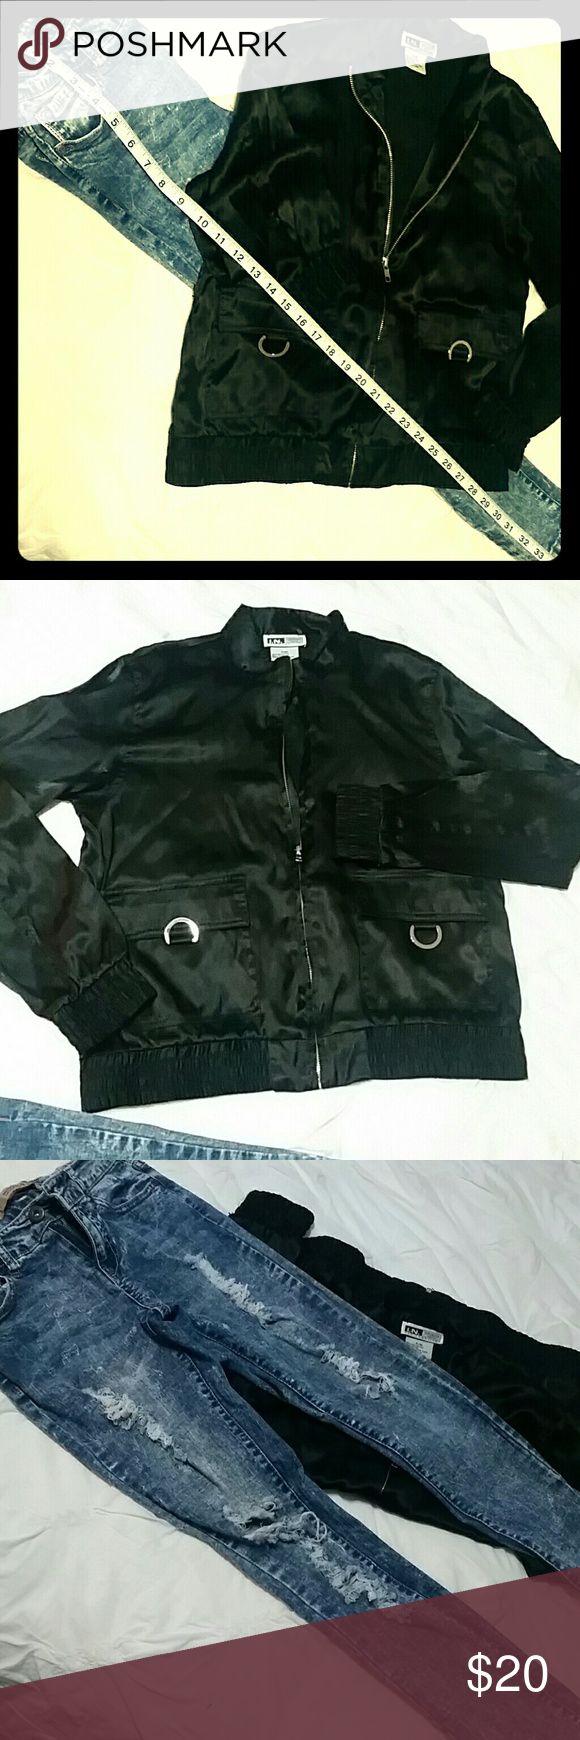 Jeggins & Blazer Bundle✌🗯🎶 HIghway jeans jeggings size 0 & satin black blazer with zipper, size P/M ,I.N. STUDIO petite Highway Jeans Jackets & Coats Jean Jackets